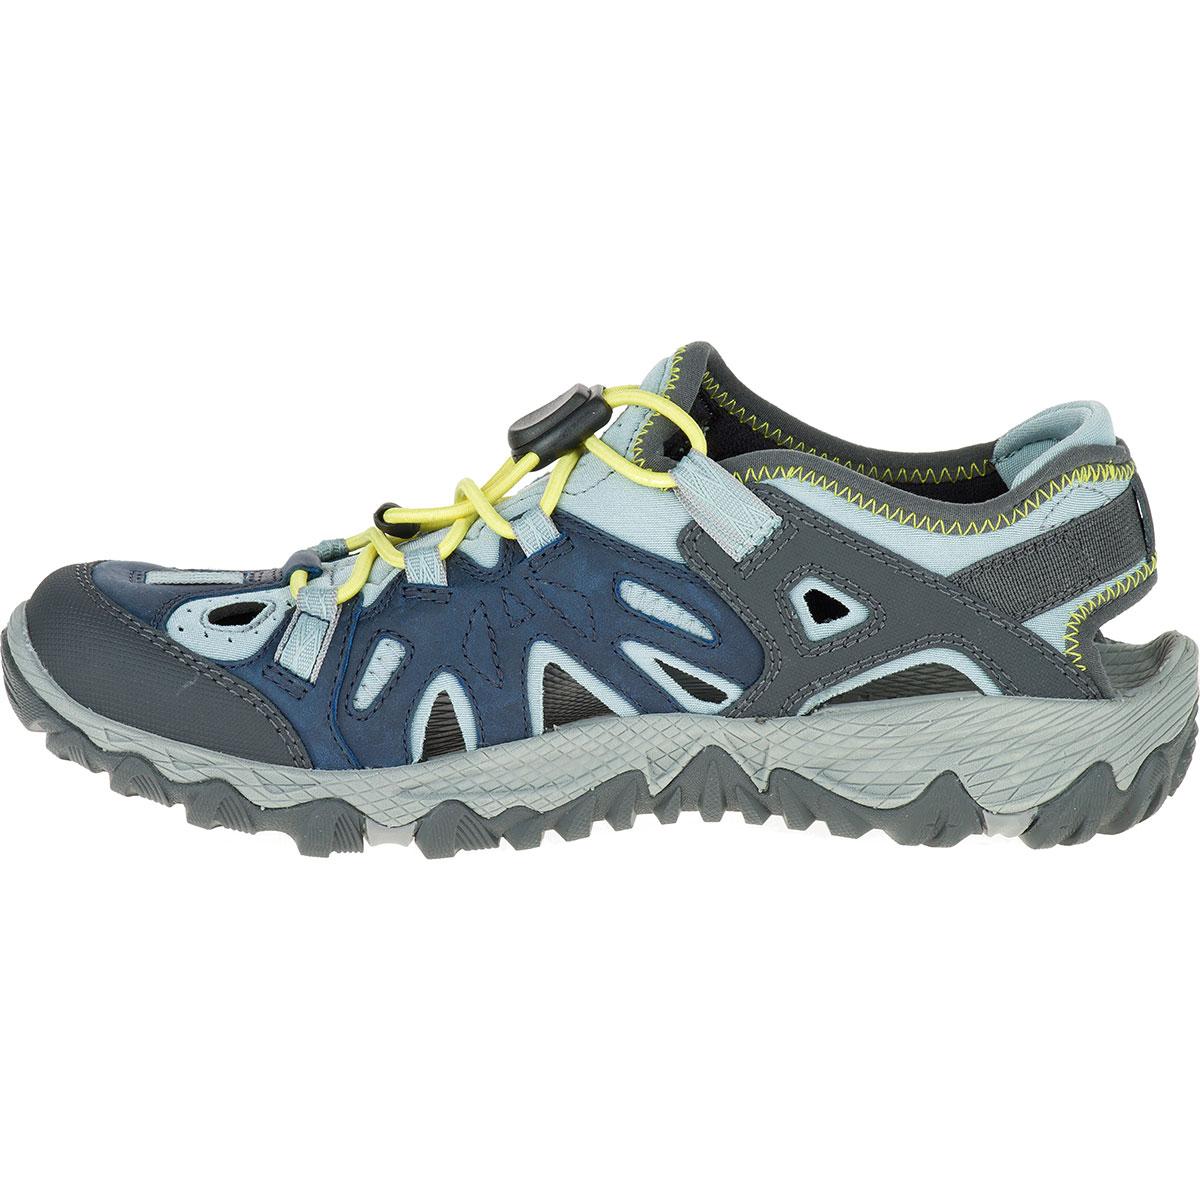 Out Blaze Sieve Hiking Shoes